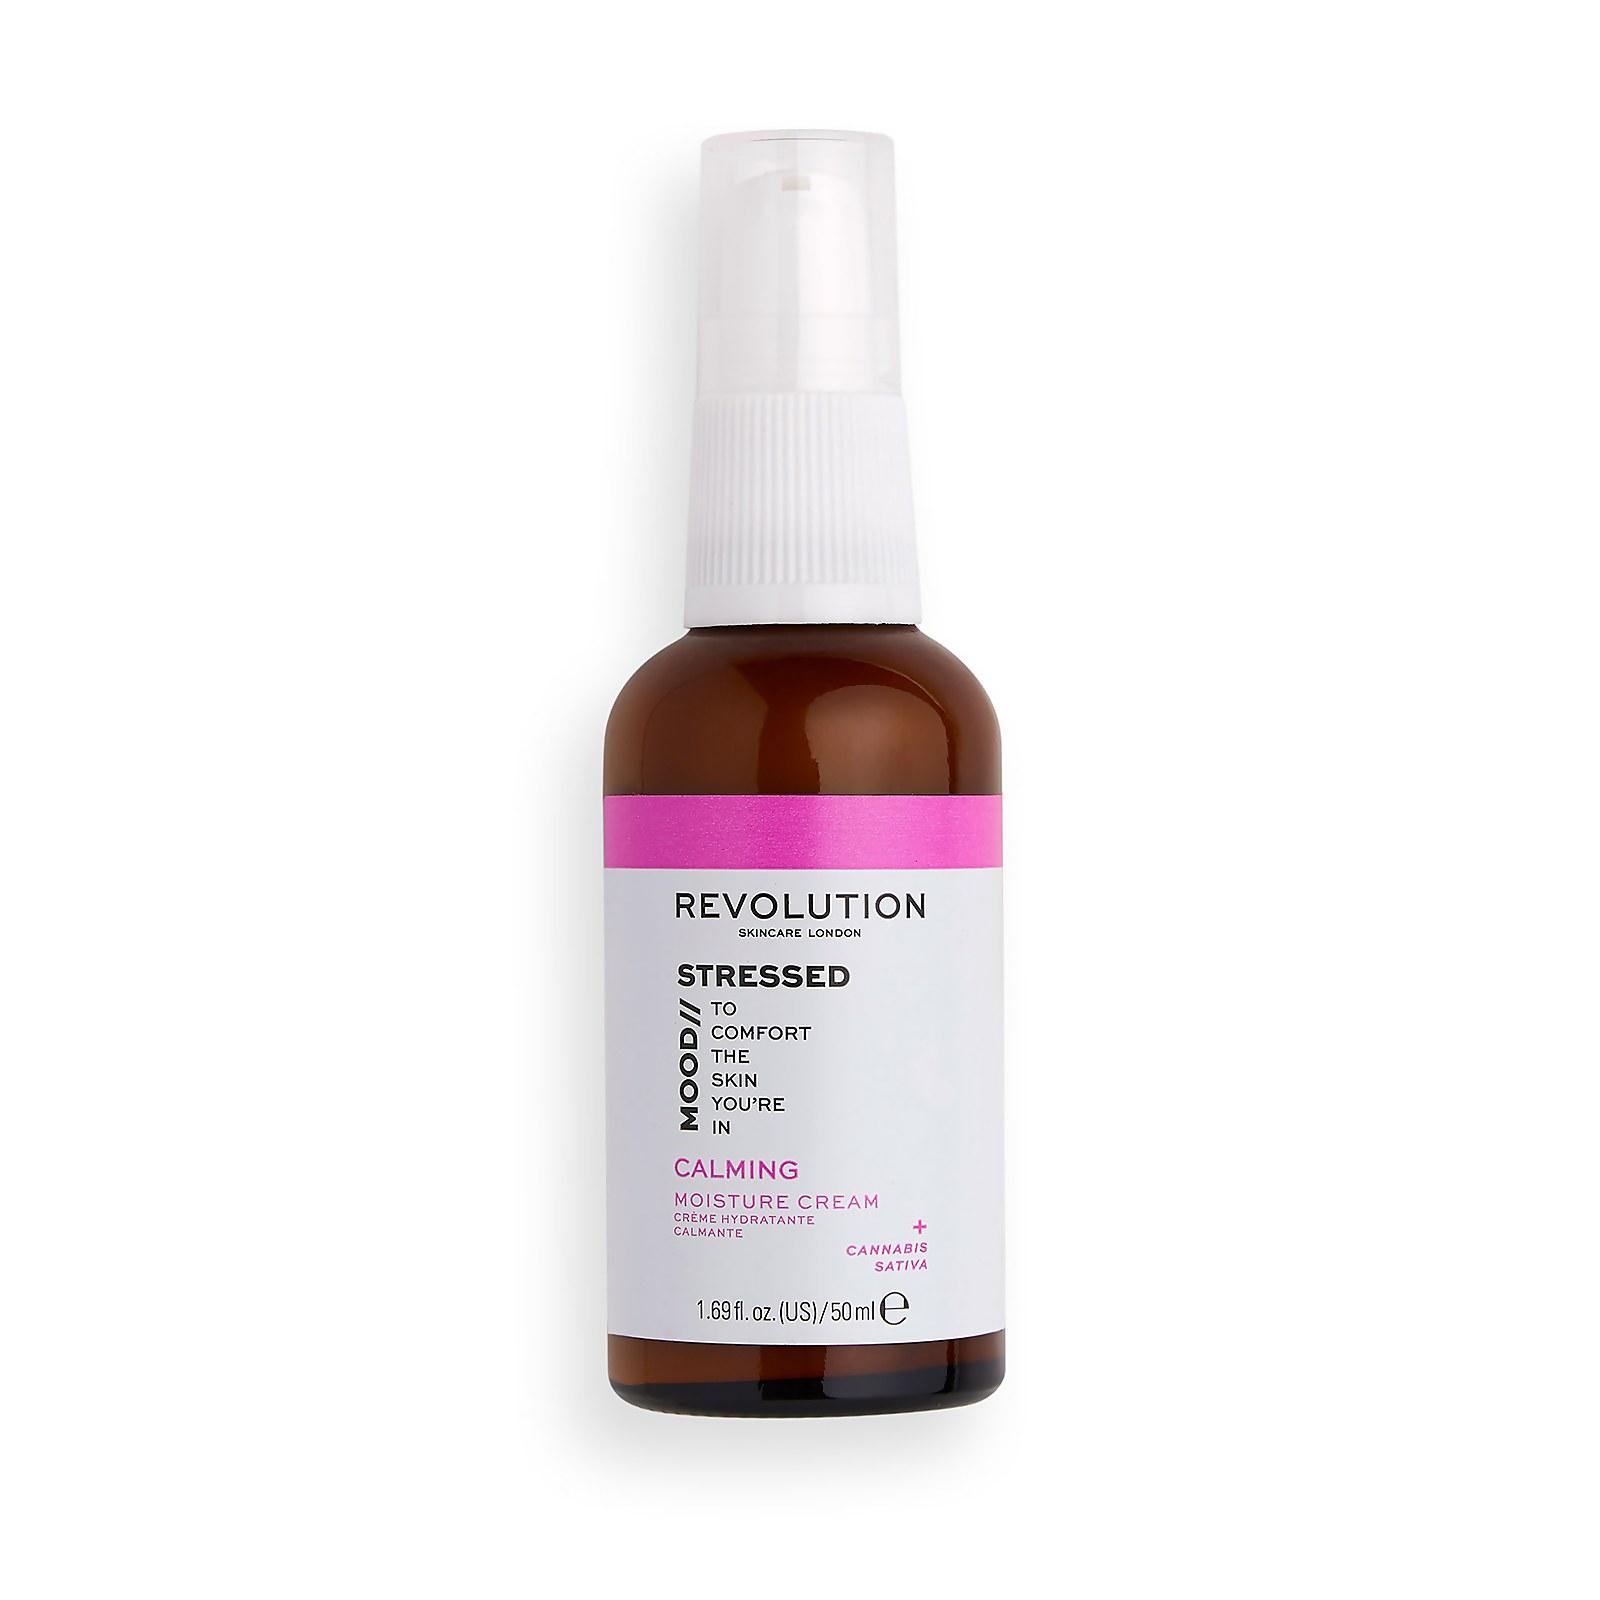 Купить Revolution Skincare Mood Calming Moisture Cream 50ml